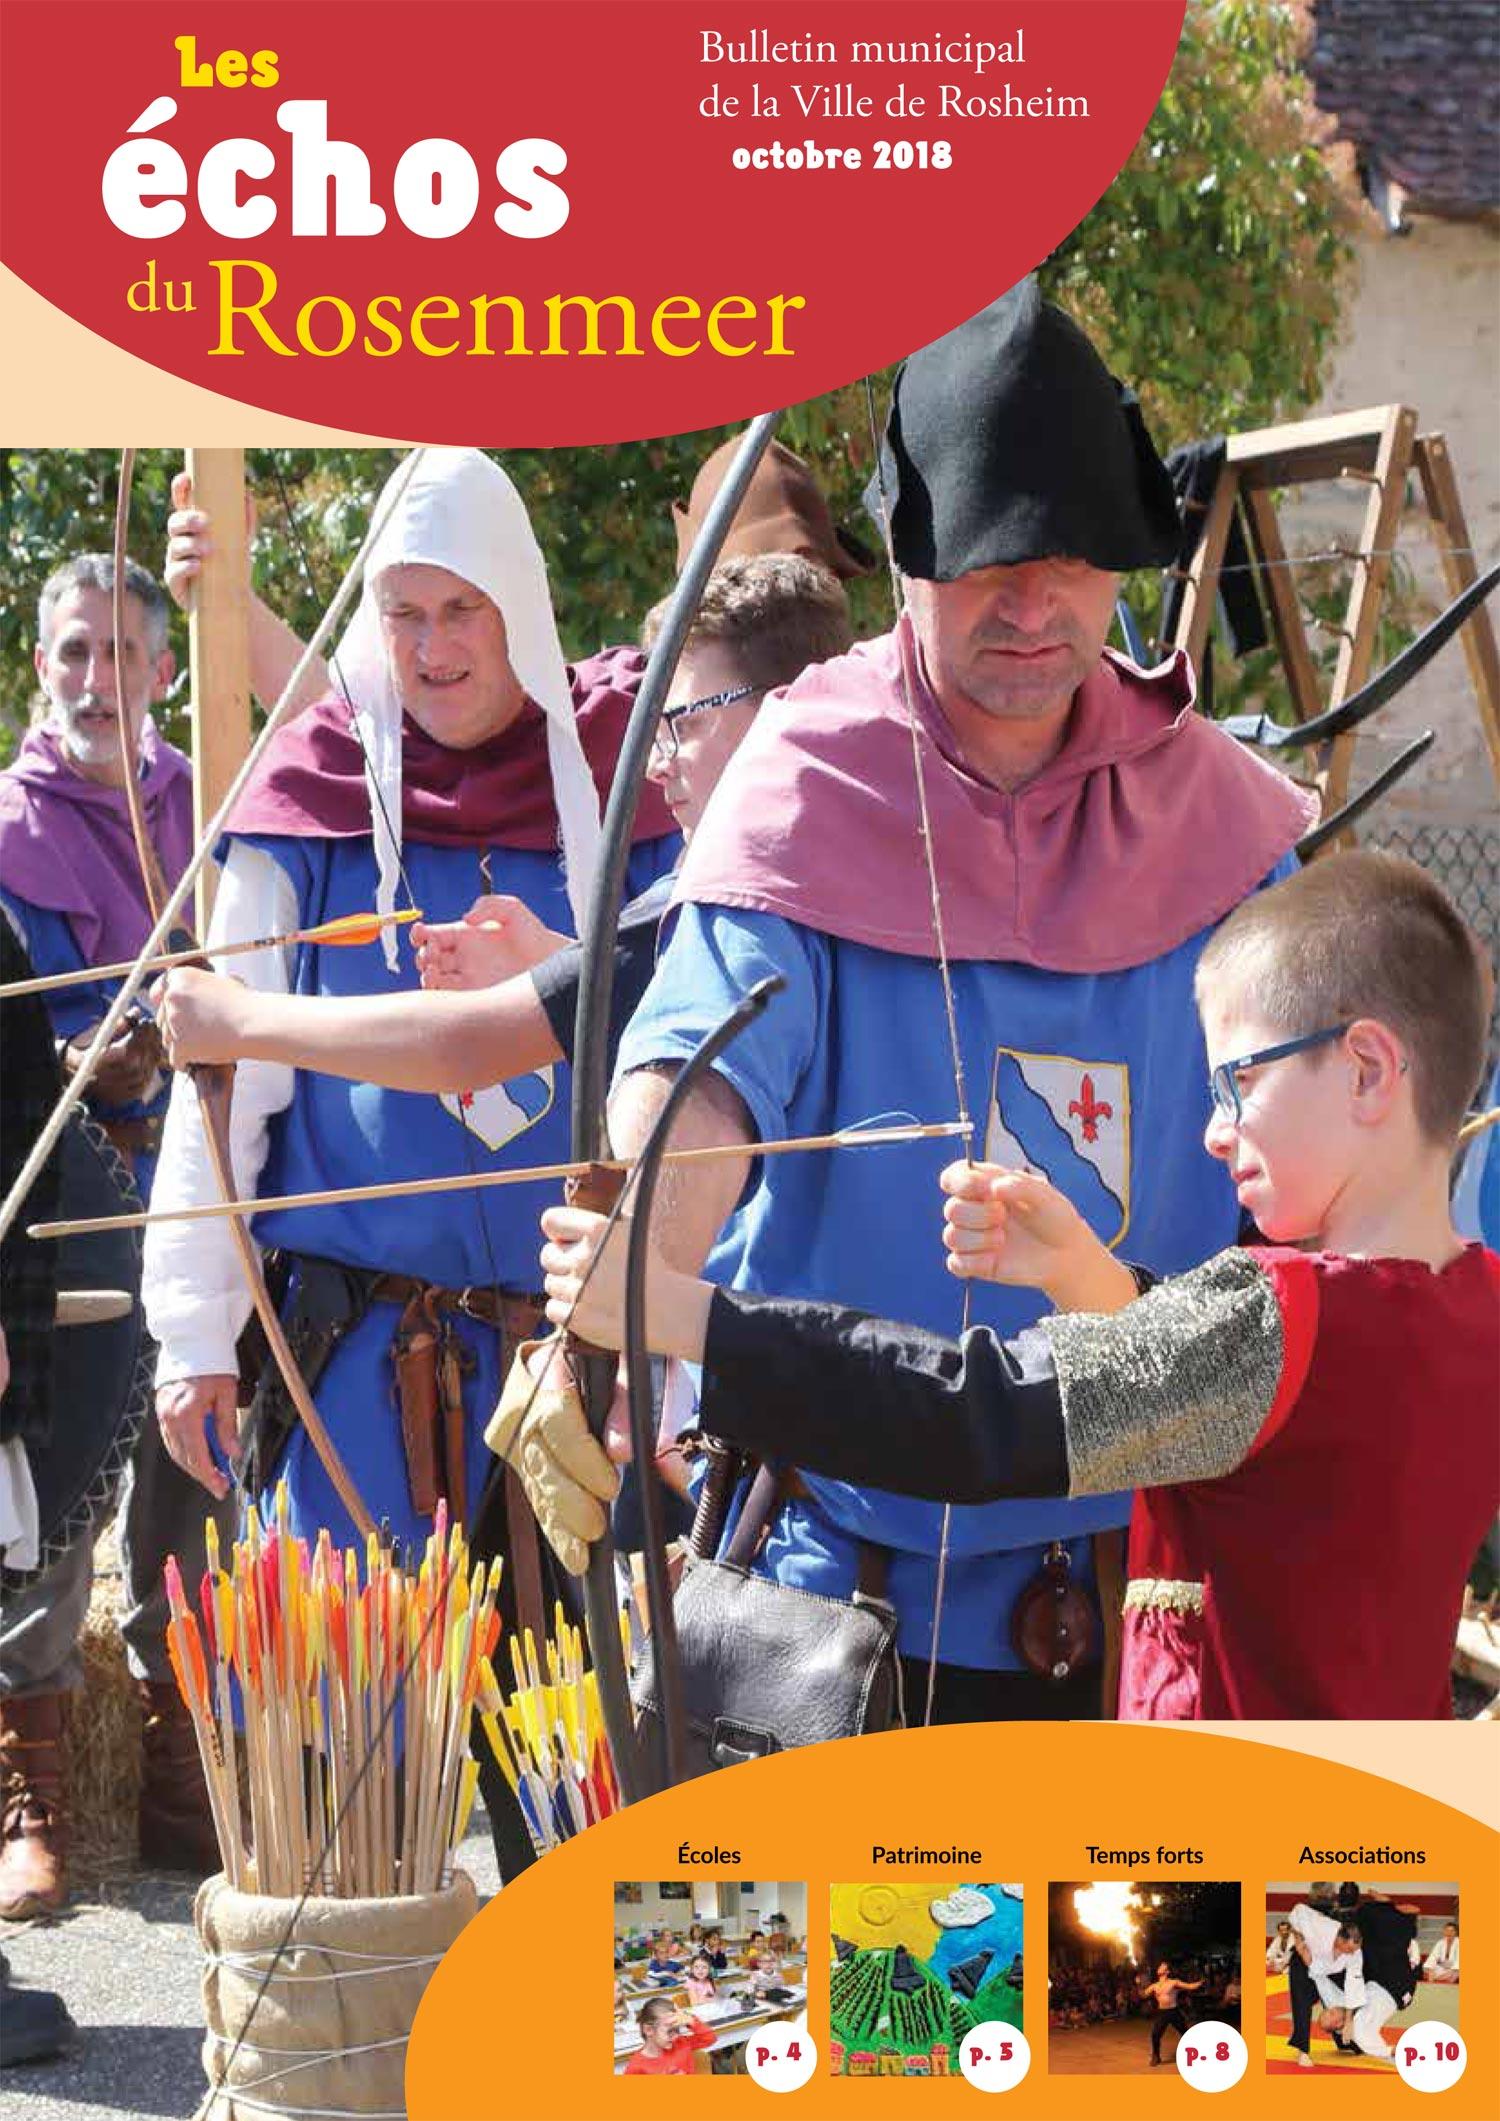 Les Echos du Rosenmeer